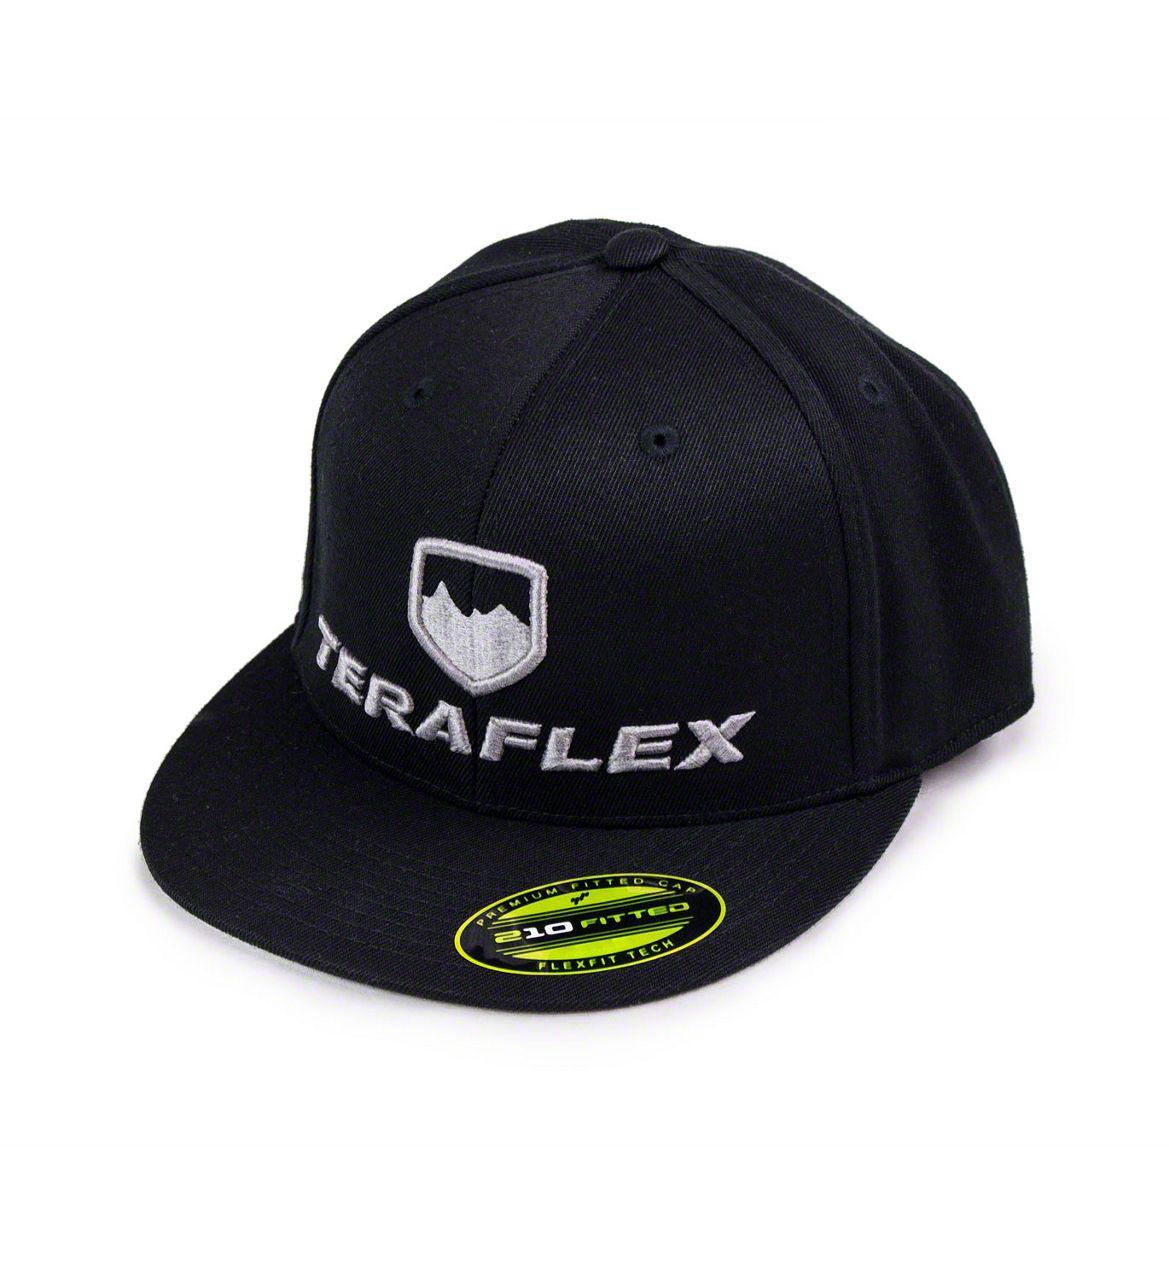 Teraflex Premium FlexFit Flat Visor Hat - Black